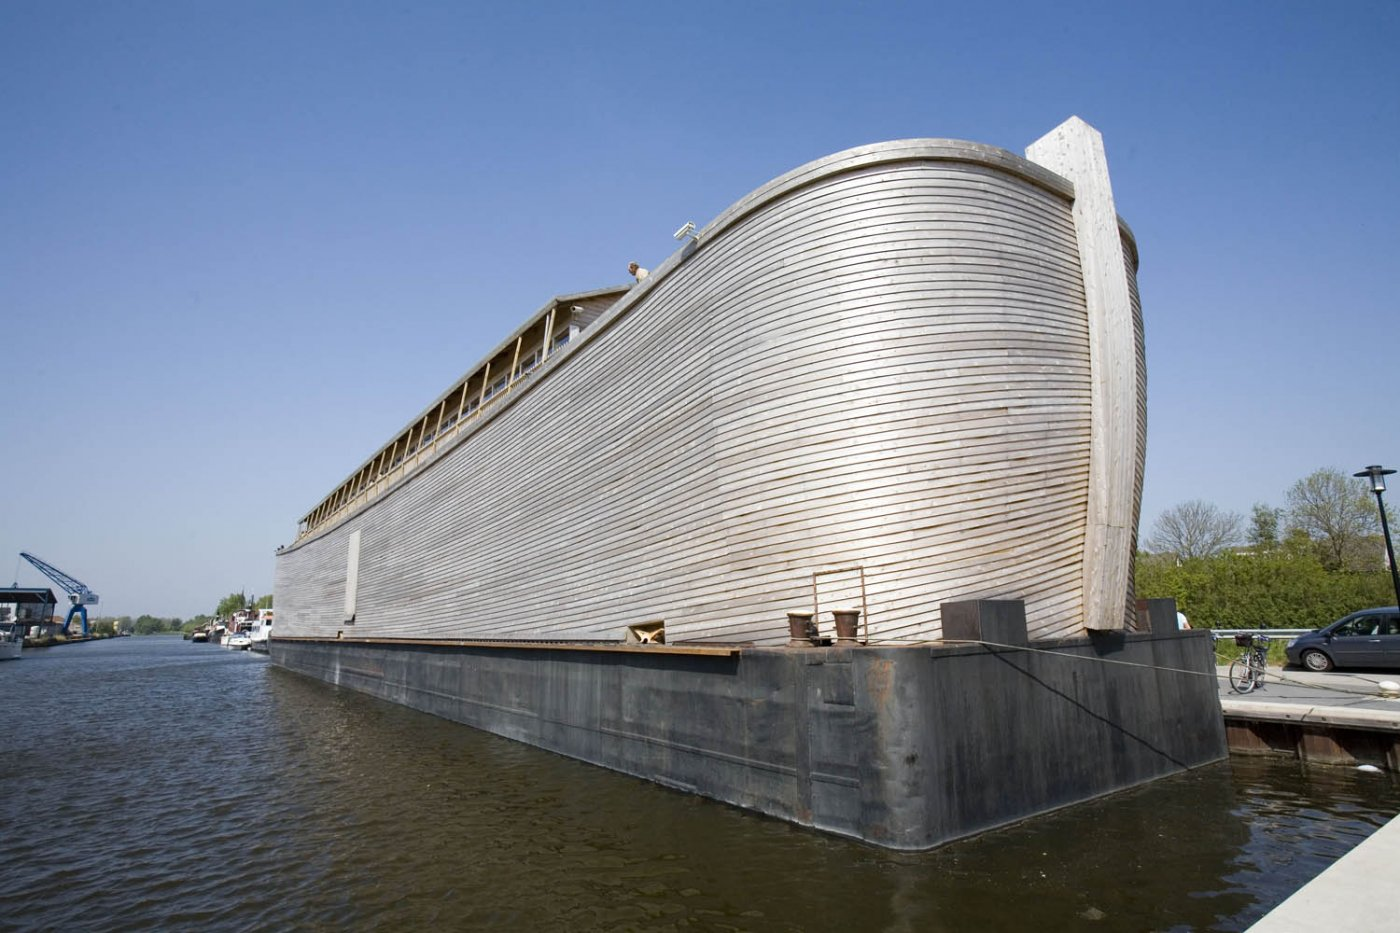 Фото Ноев ковчег Йохана. Нидерланды, Zuid-Holland, Dordrecht, Maasstraat, 14